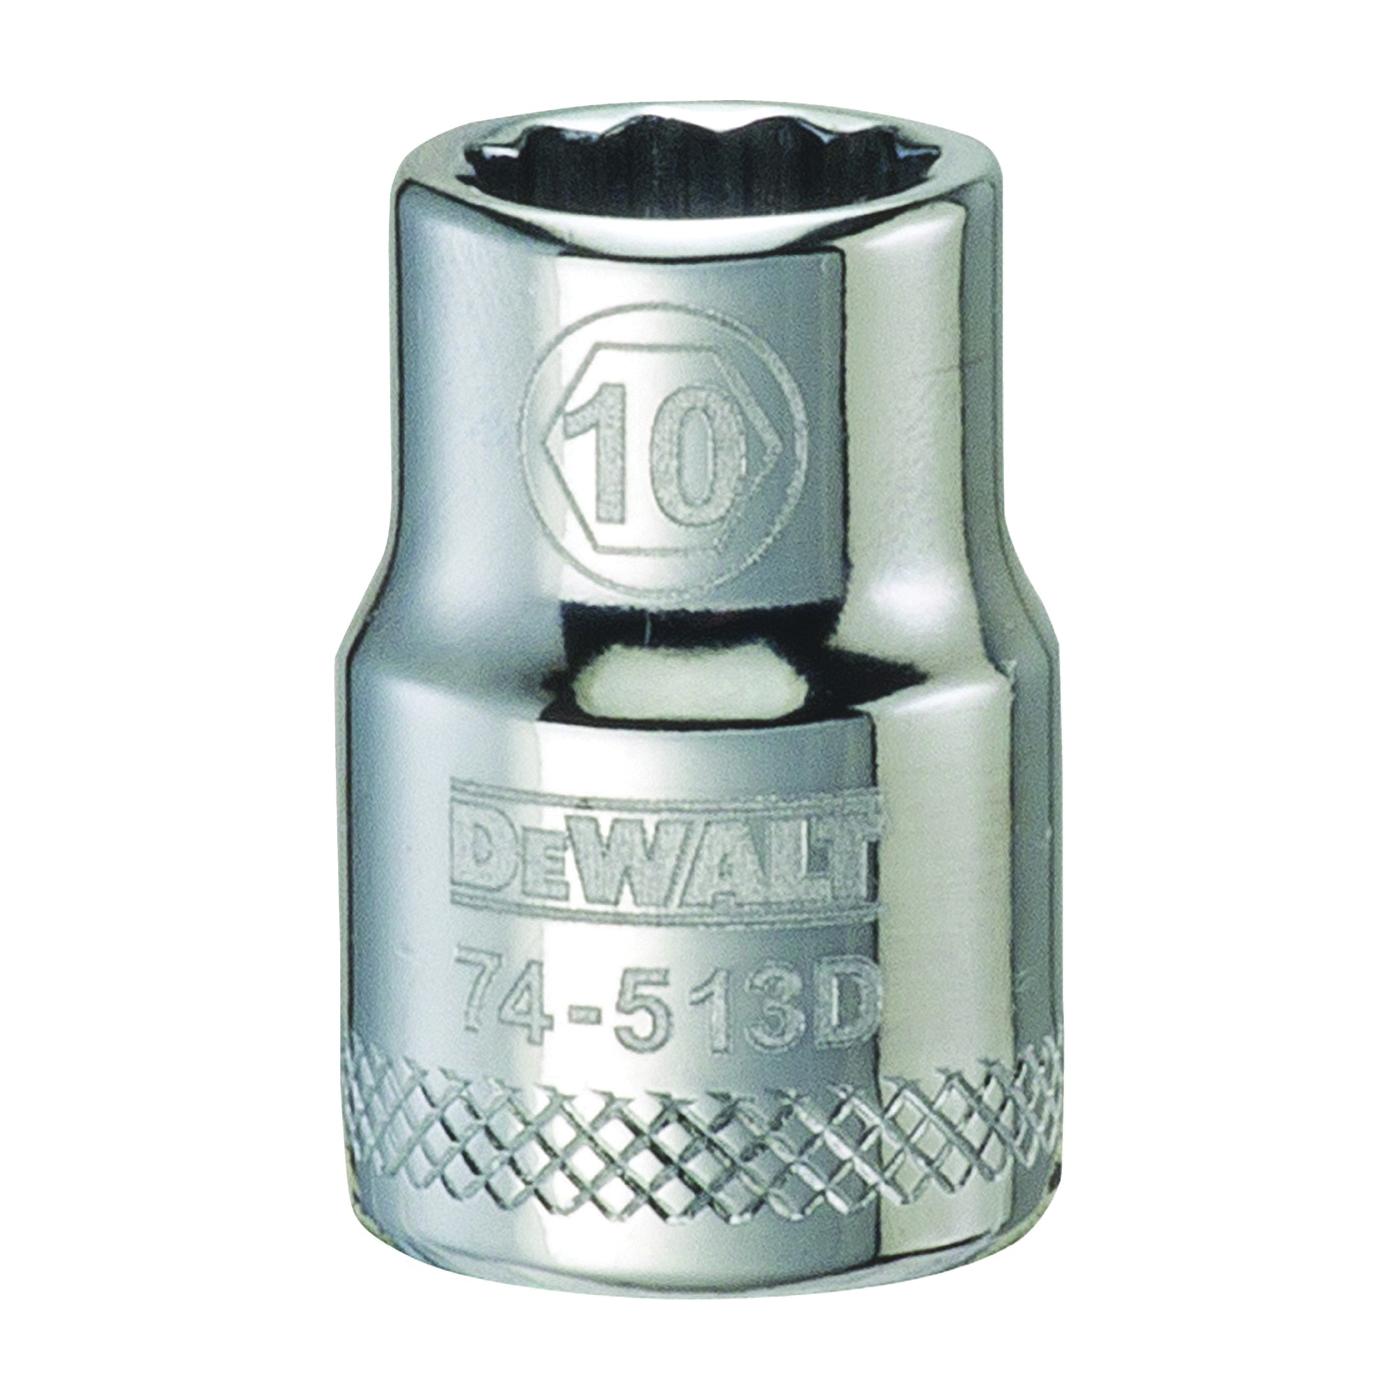 Picture of DeWALT DWMT74513OSP Hand Socket, 10 mm Socket, 3/8 in Drive, 12 -Point, Vanadium Steel, Polished Chrome